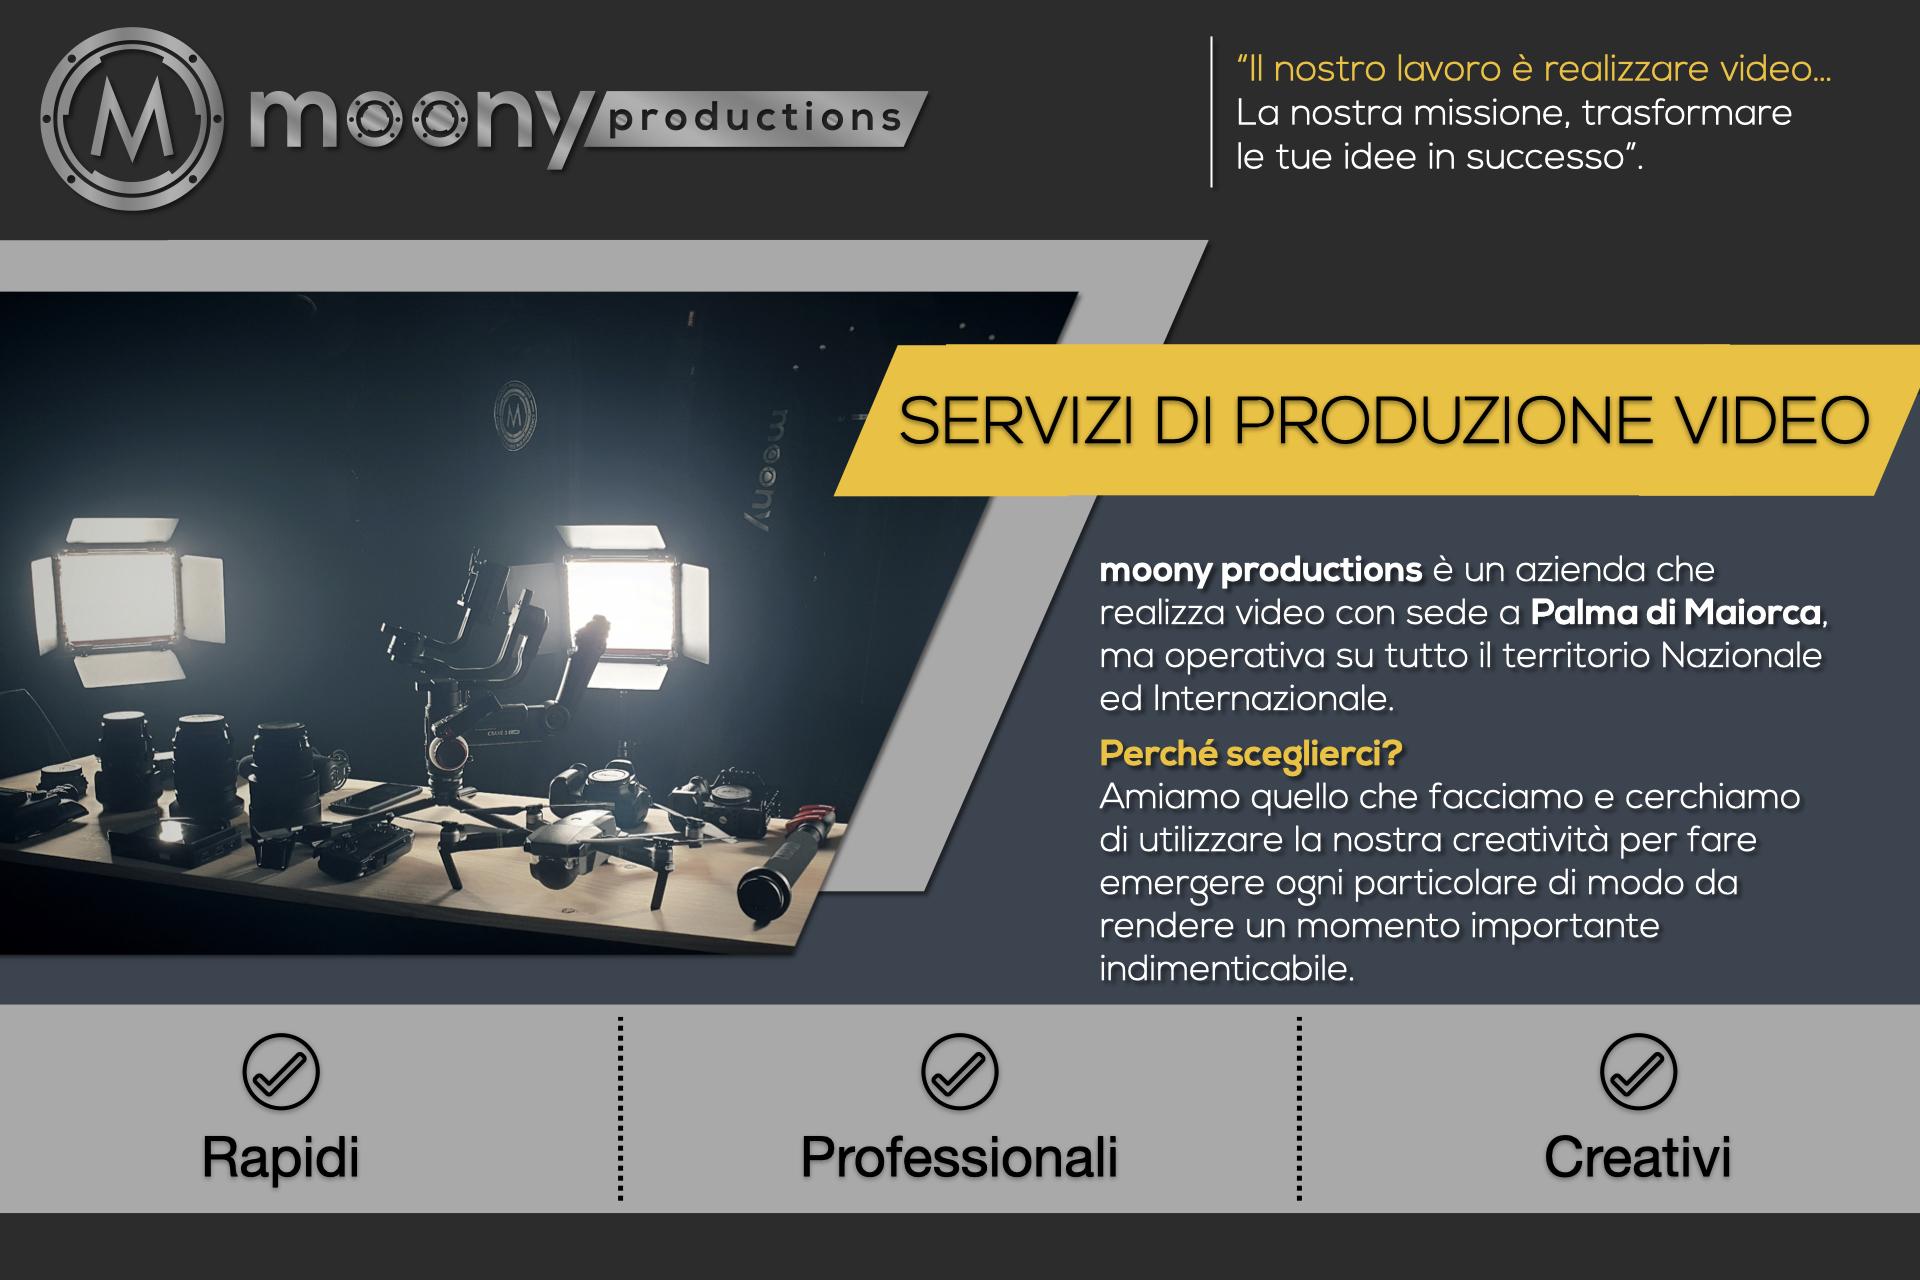 MARCO MUNIZZA MOONY PRODUCTIONS